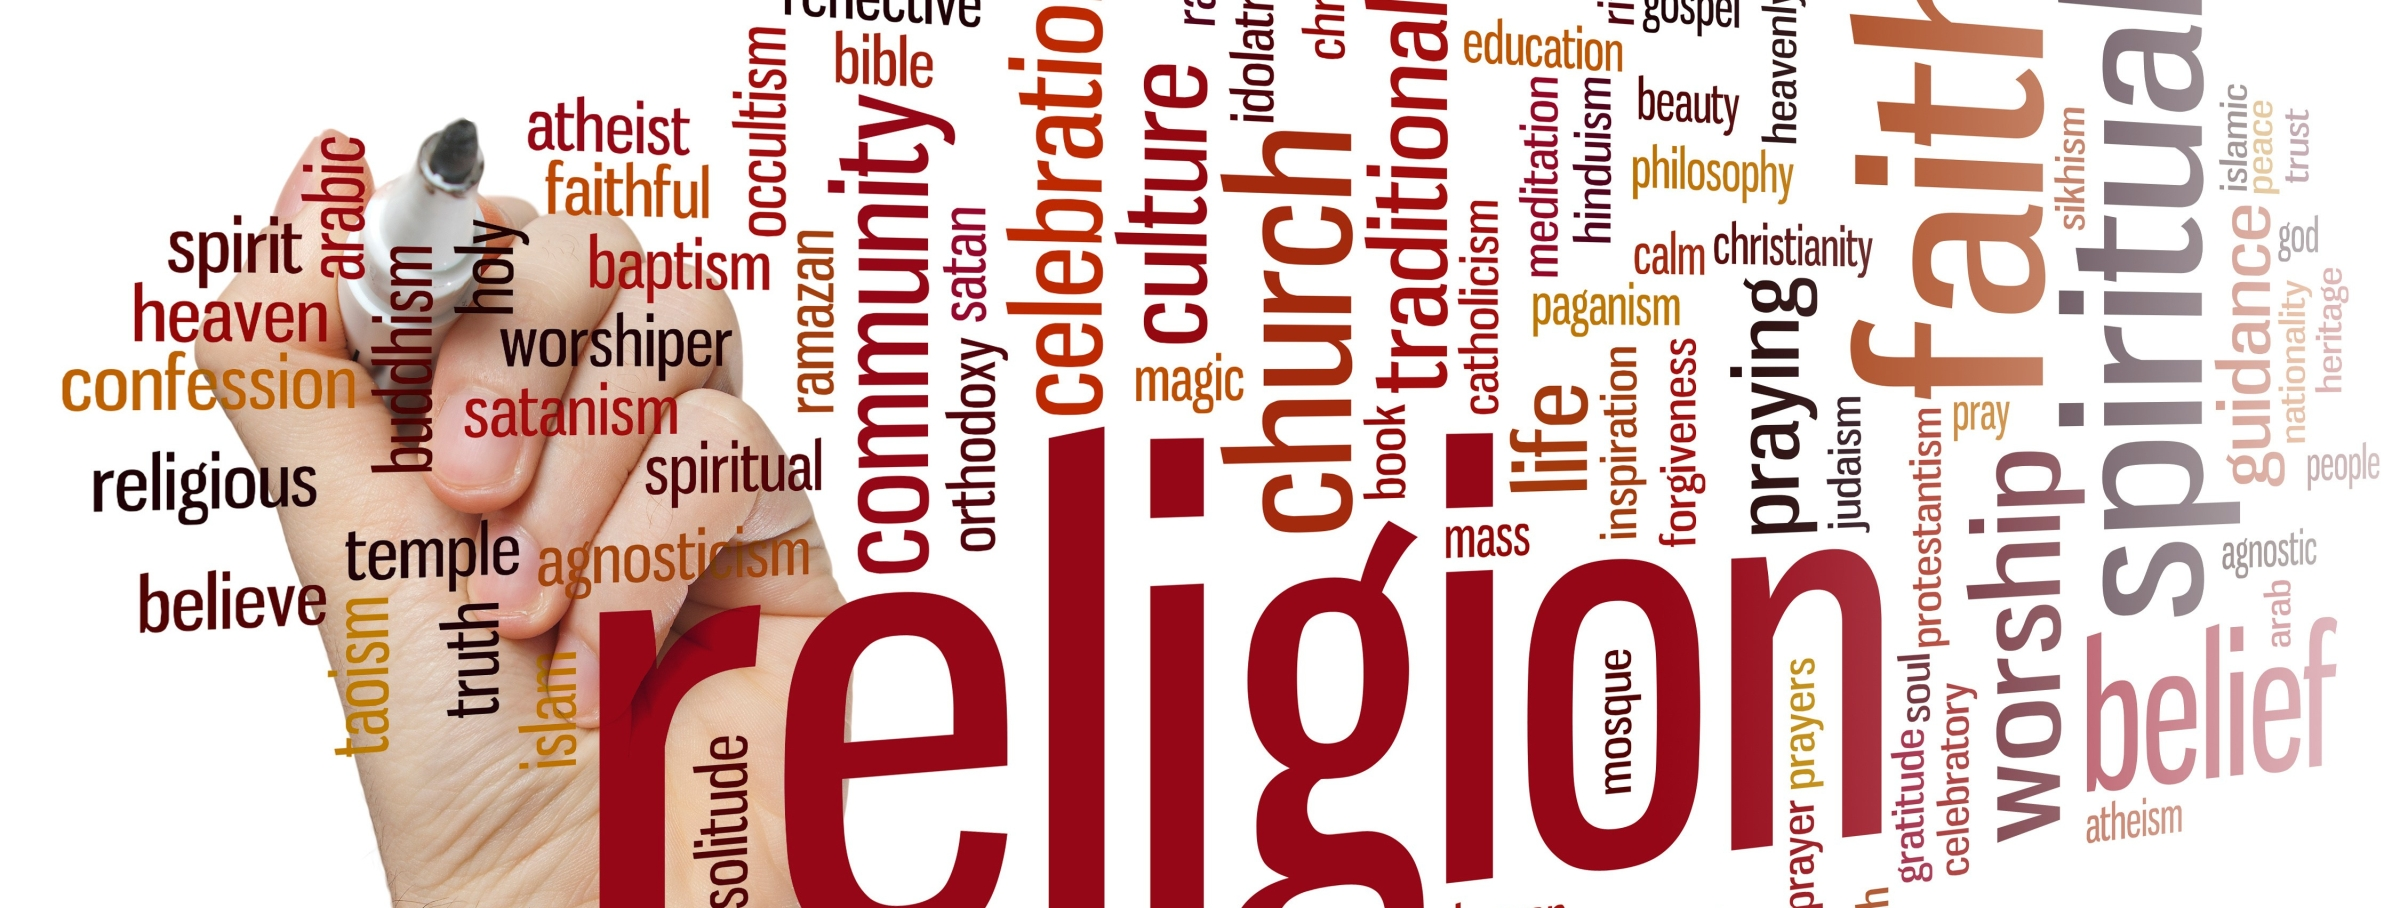 Religion world building